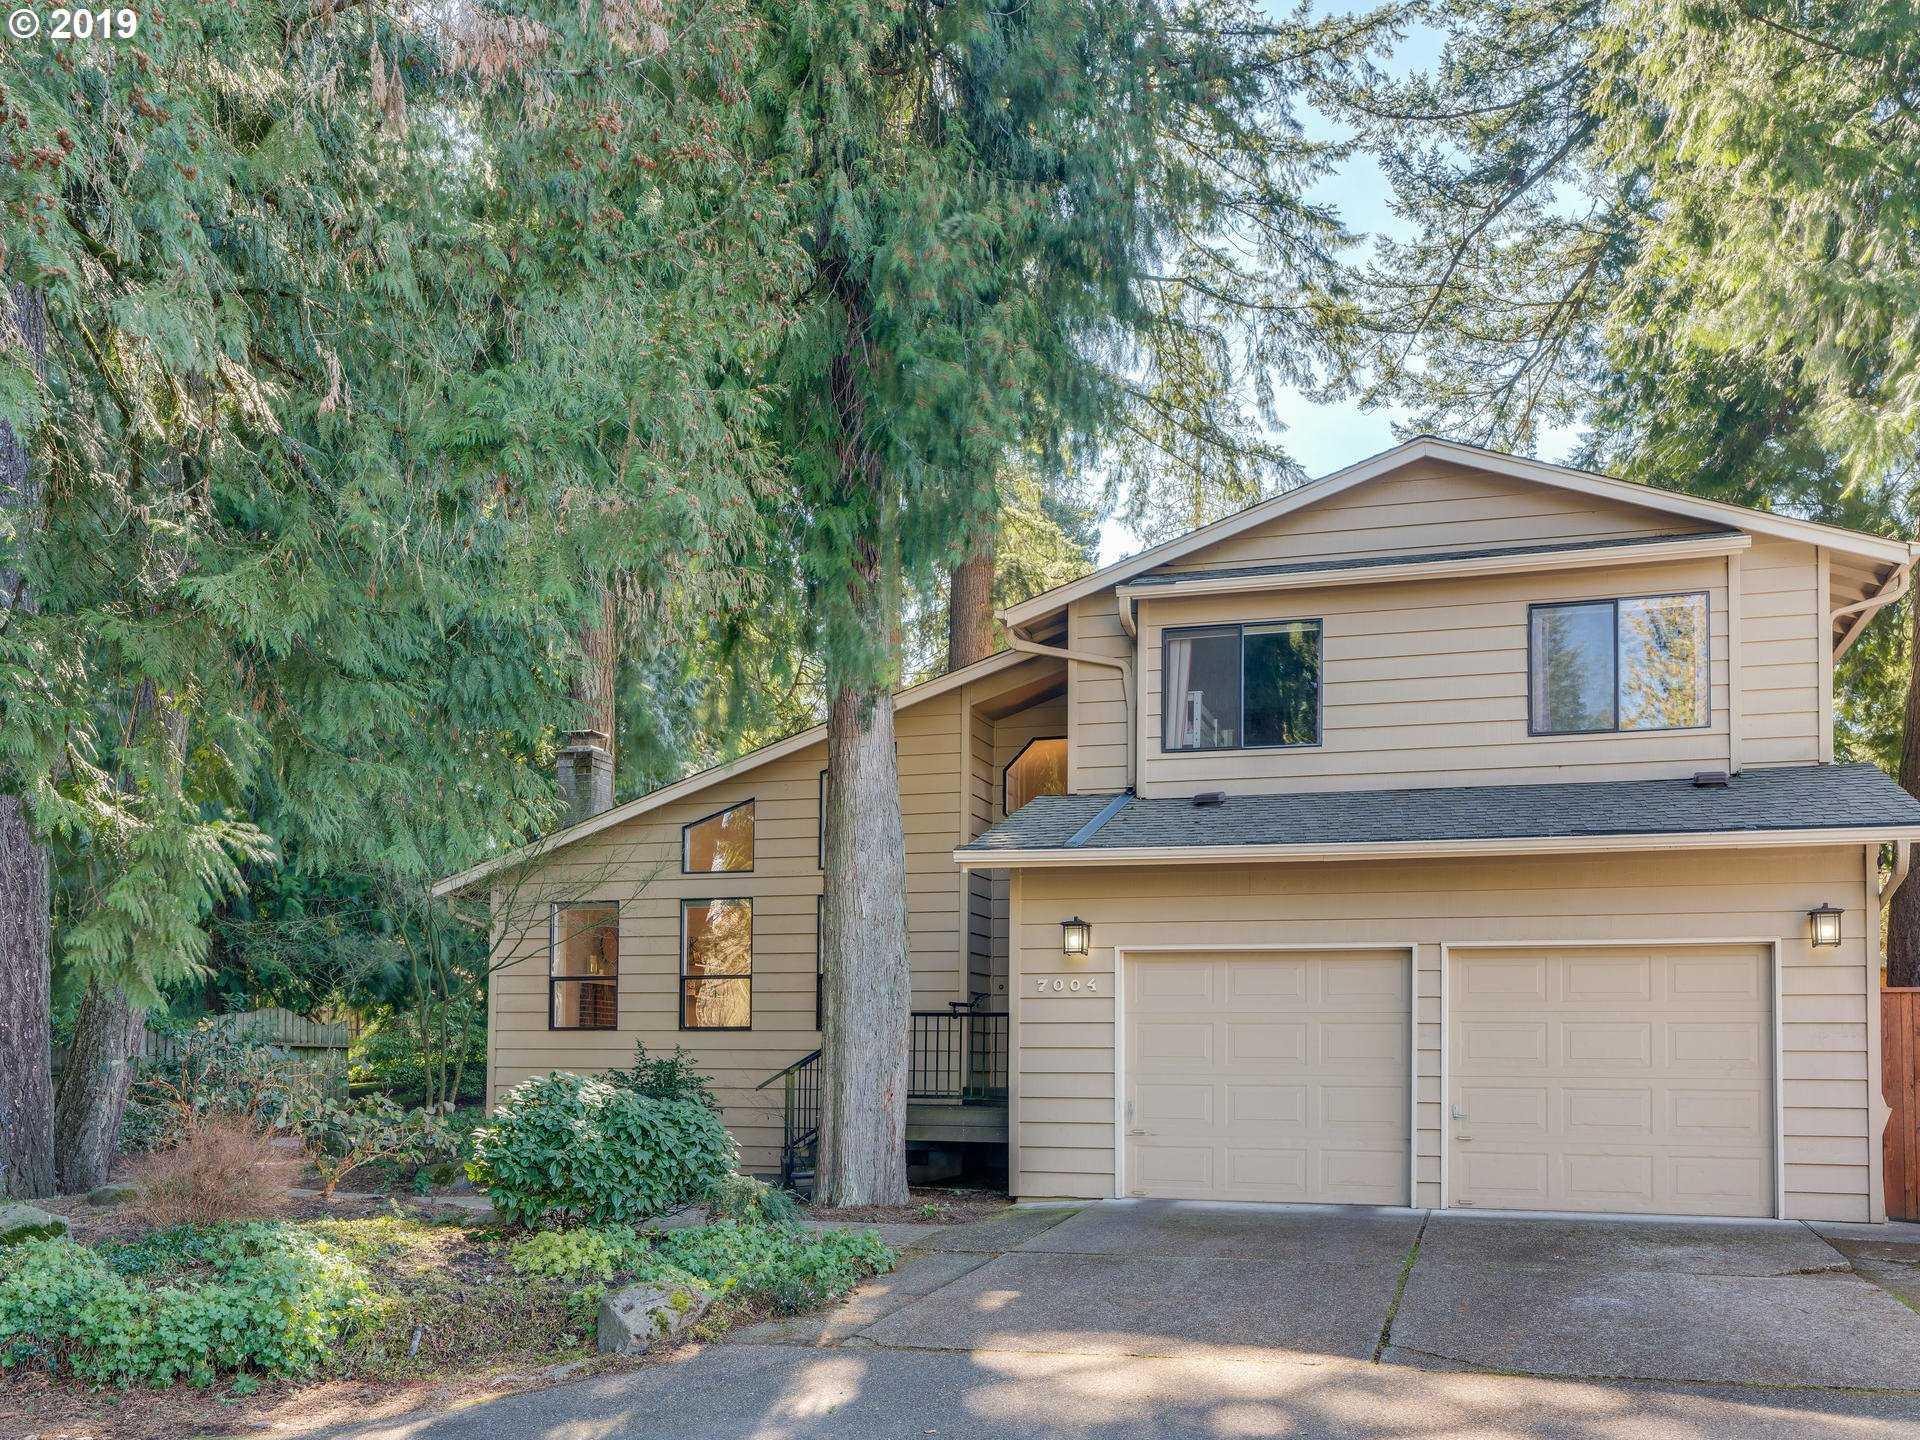 $499,000 - 3Br/3Ba -  for Sale in Garden Home, Portland